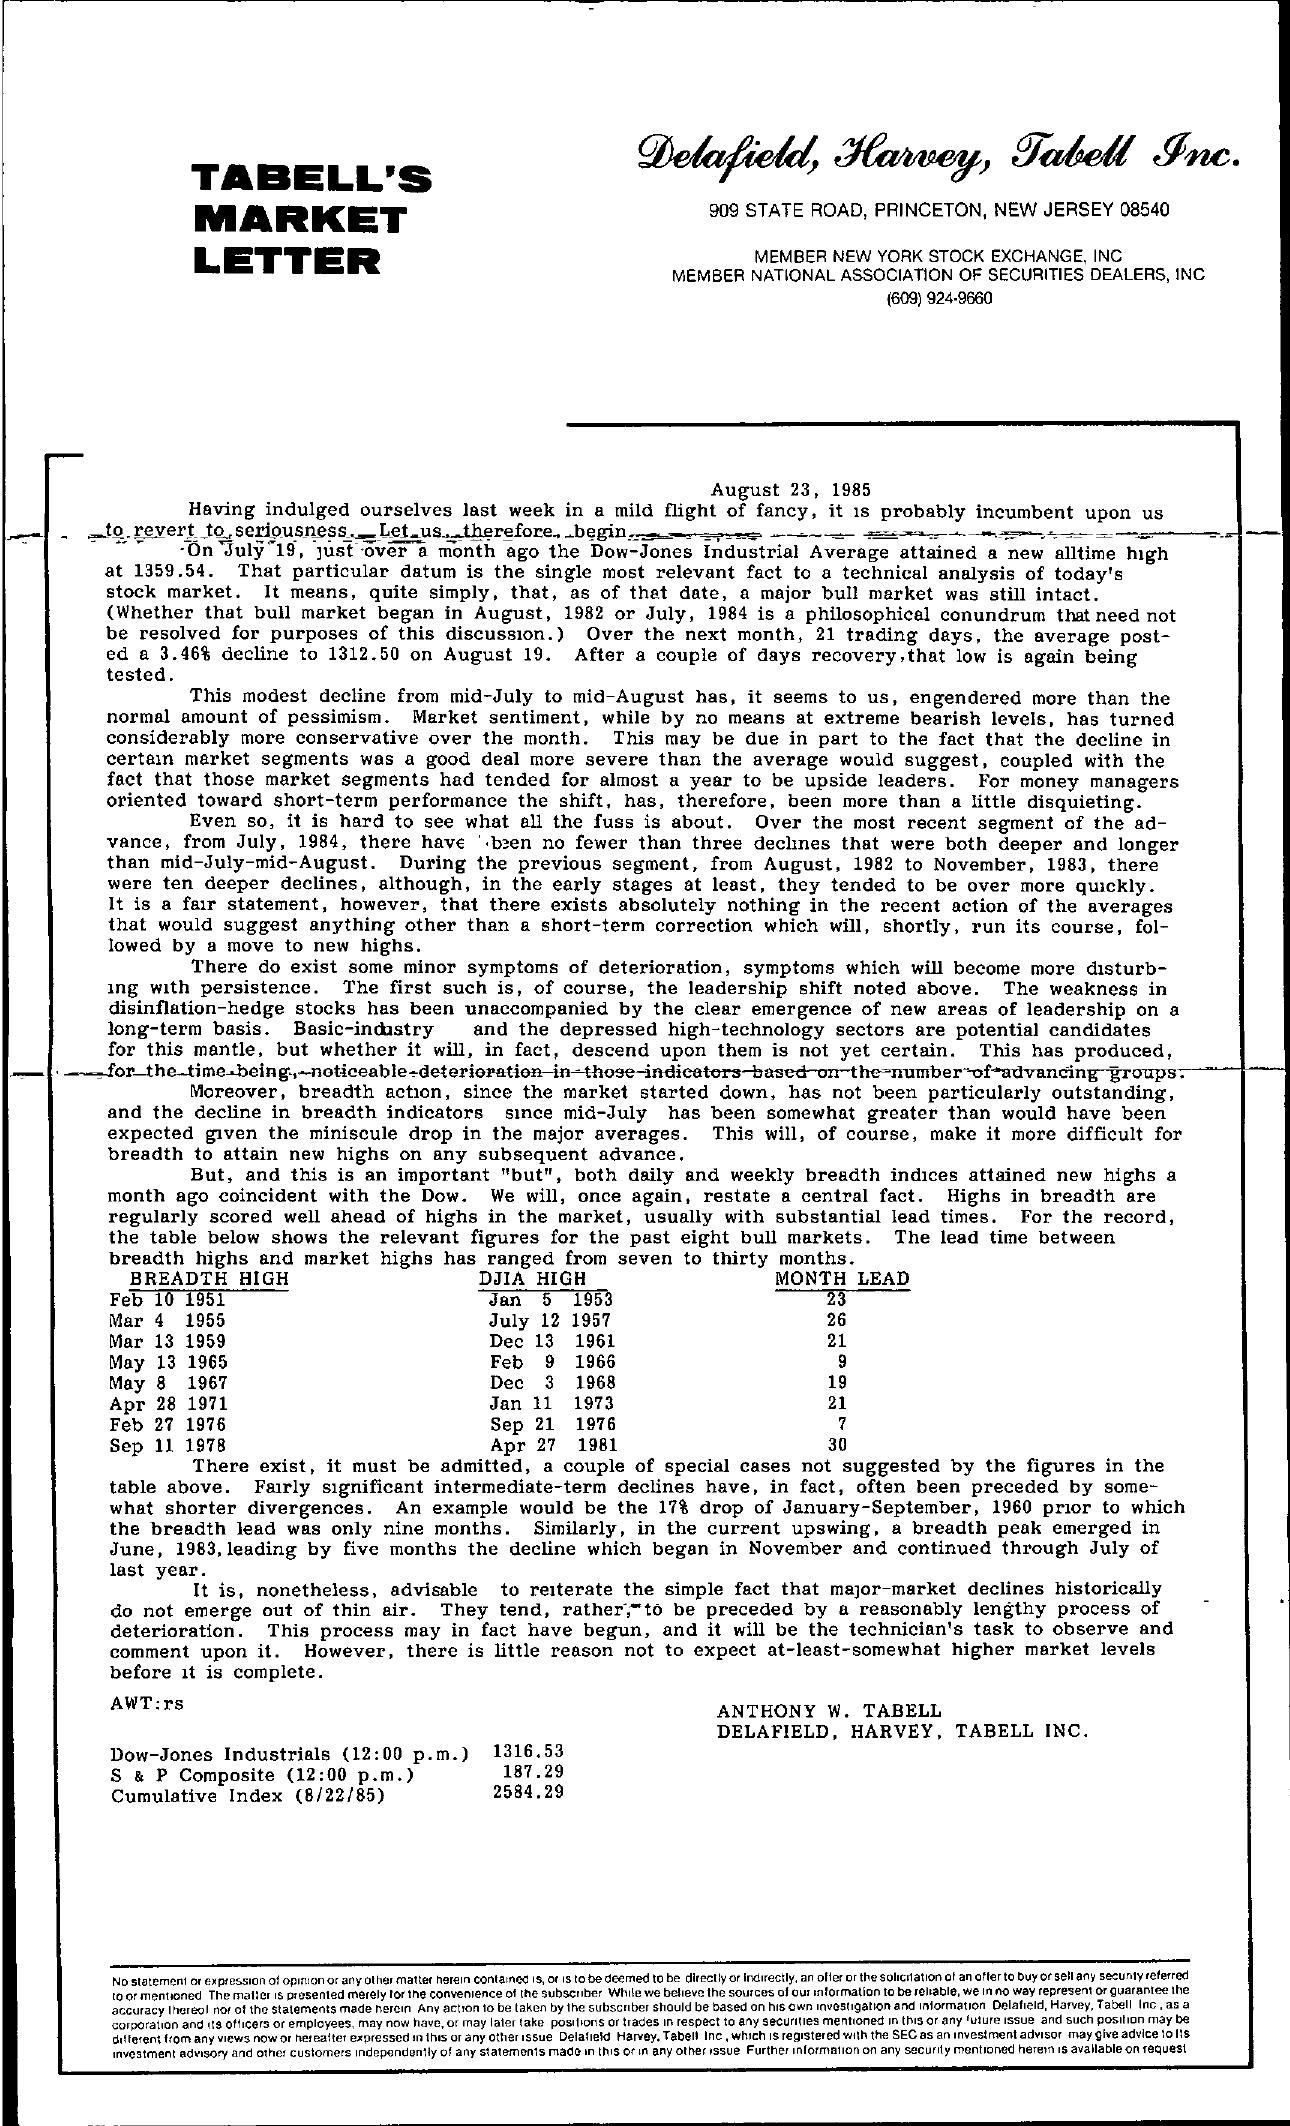 Tabell's Market Letter - August 23, 1985